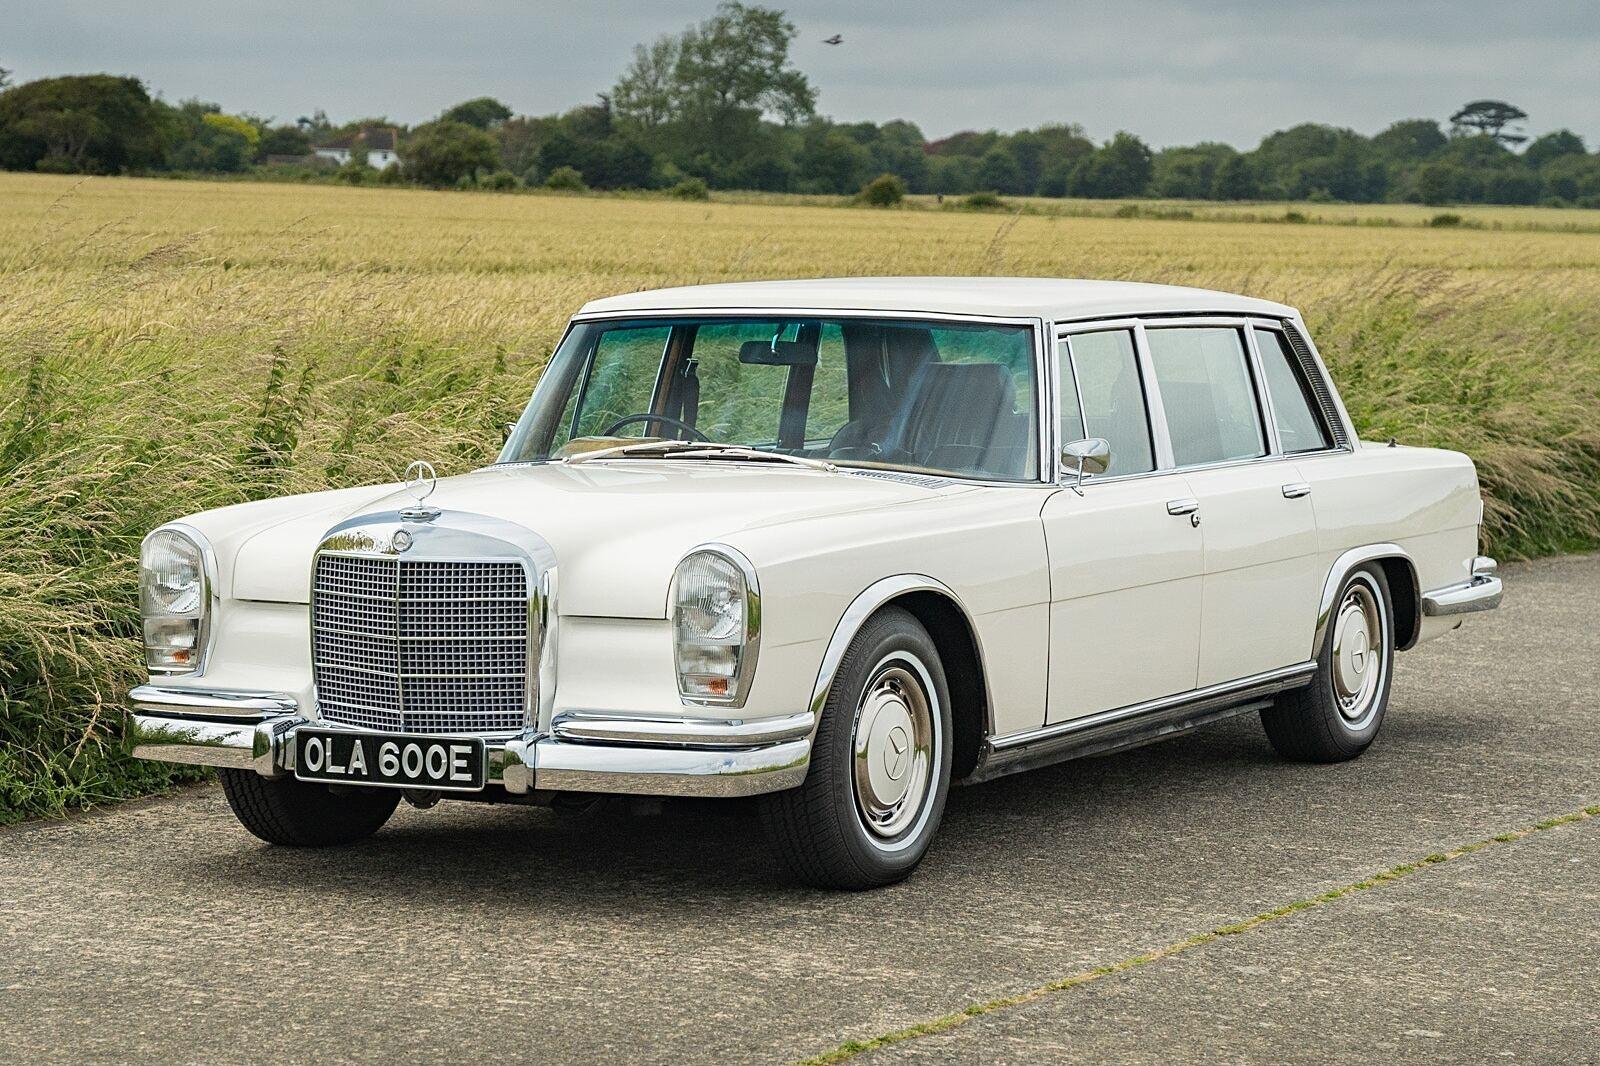 George Harrison's 1967 Mercedes-Benz 600 Hits Auction